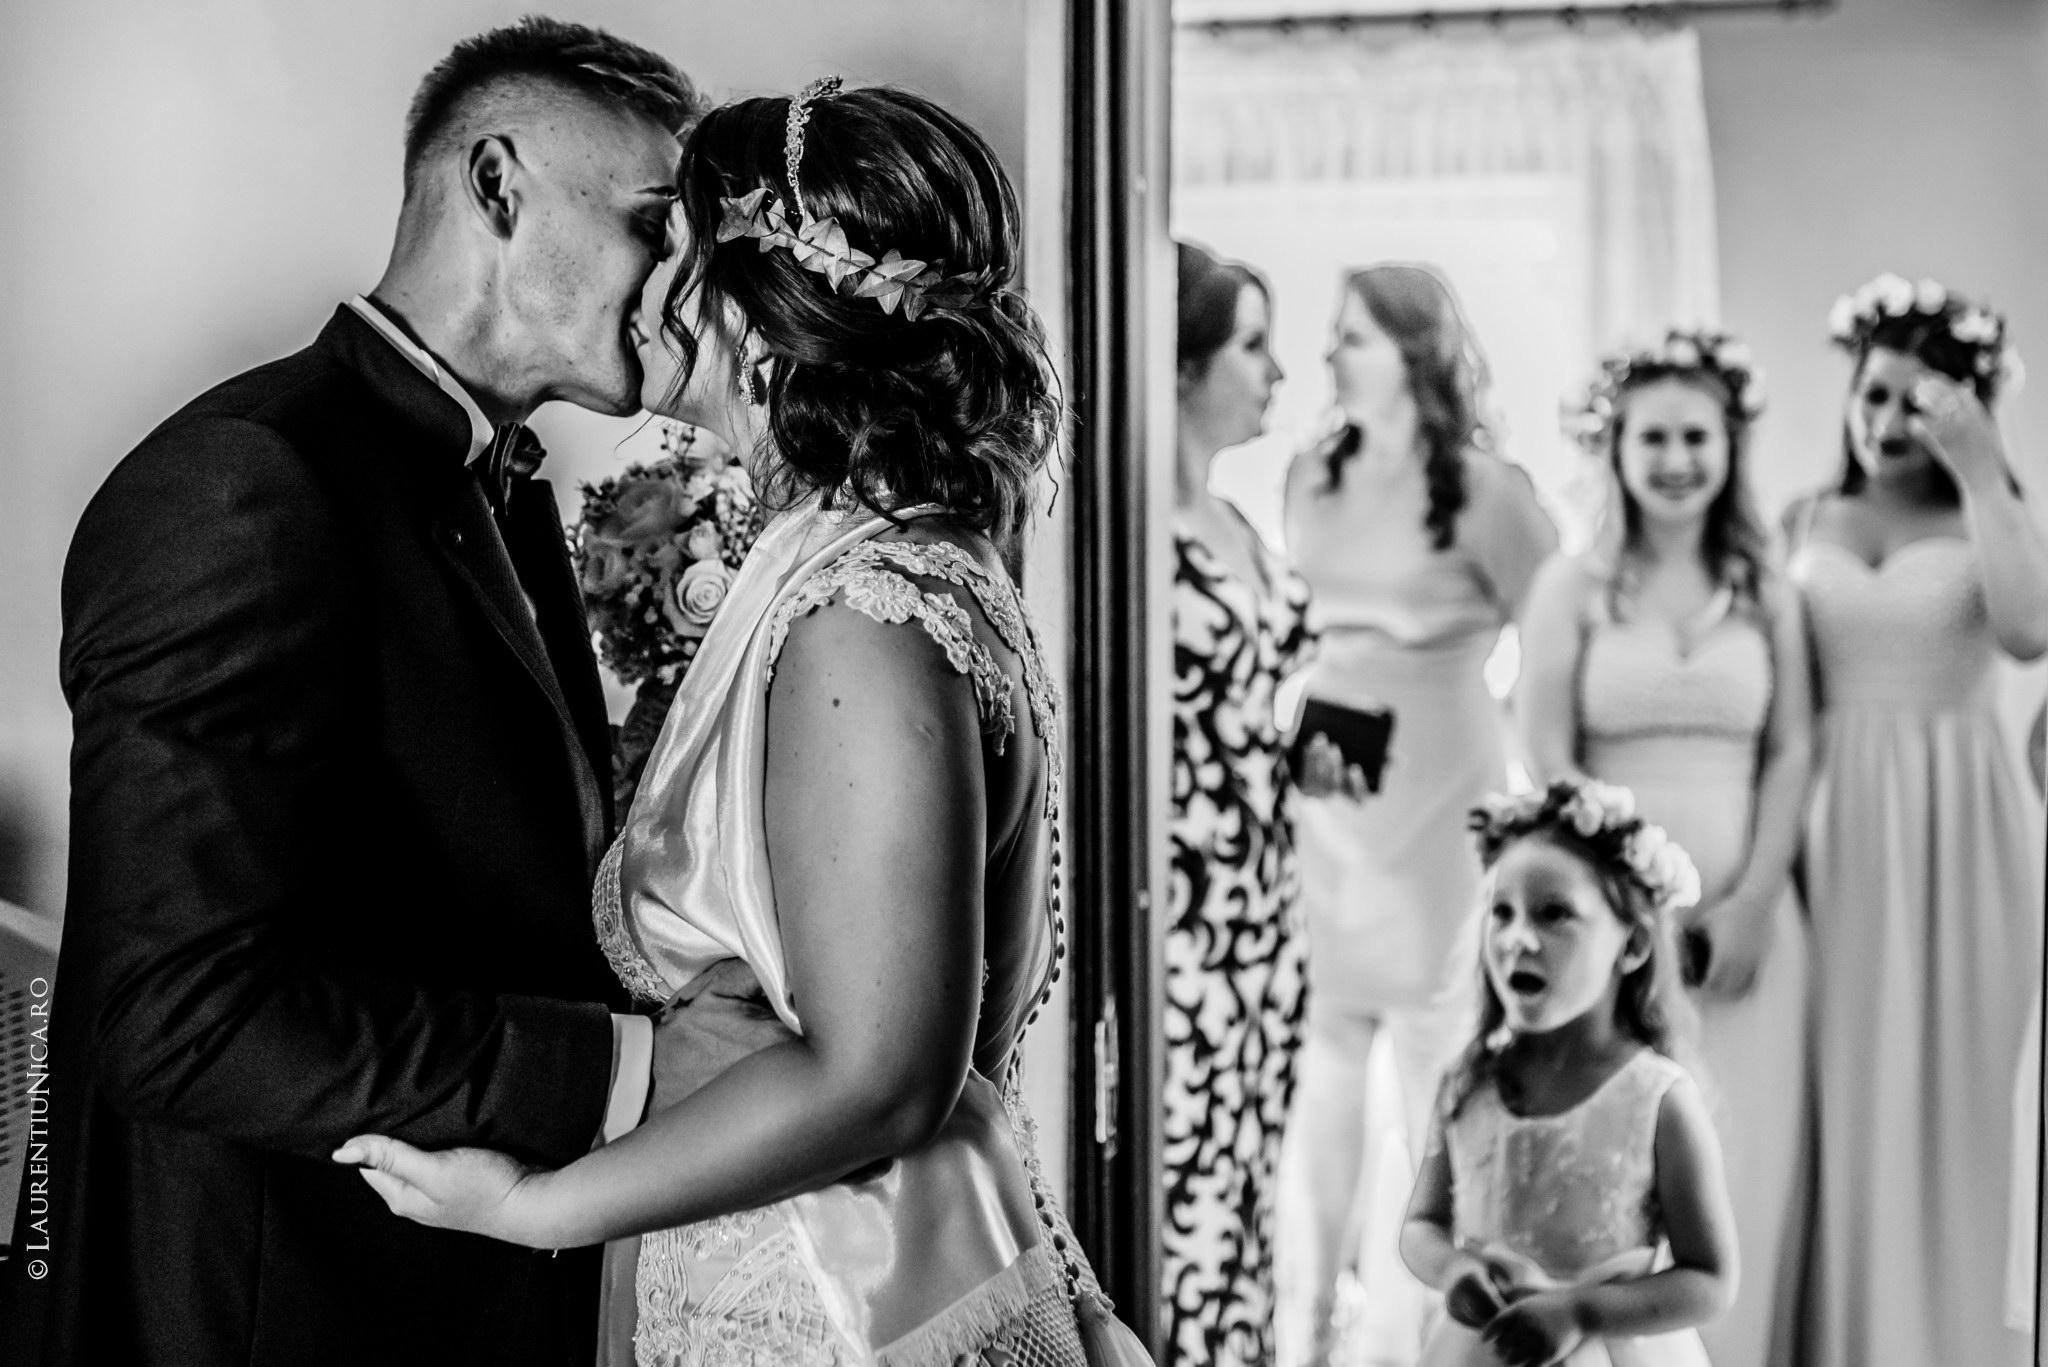 fotografii nunta Roxana si Cosmin fotograf nunta laurentiu nica 20 - Roxana & Cosmin | Fotografii nunta | Ticleni, judetul Gorj